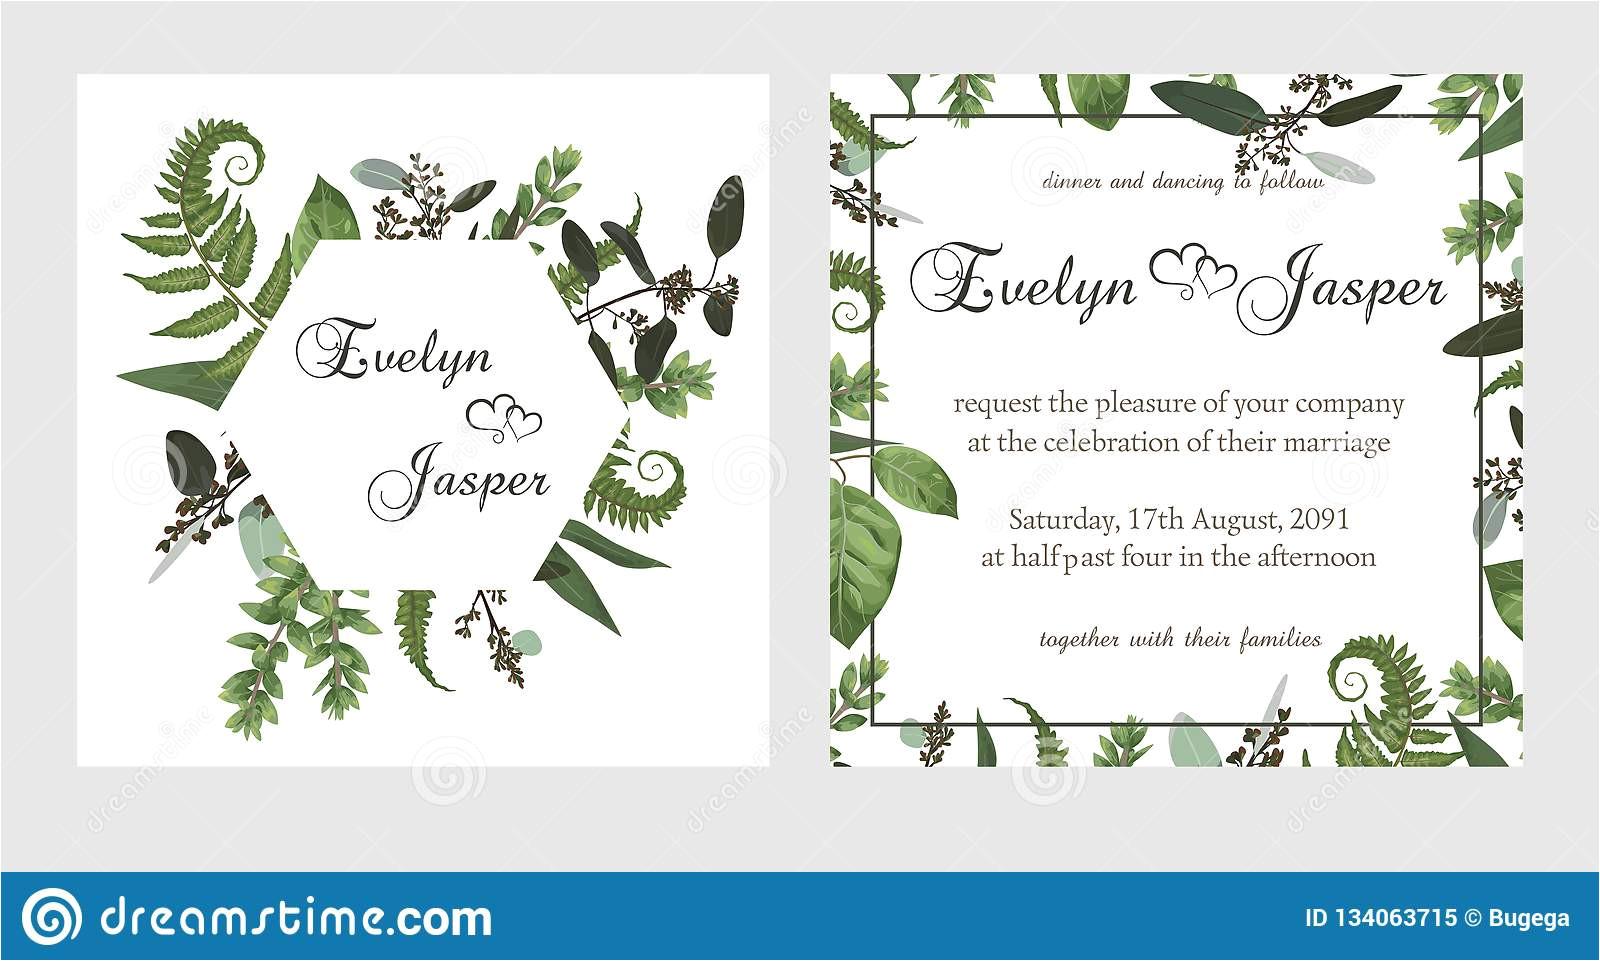 set wedding invitation greeting card save date banner vintage square round frame green fern leaf boxwo od eucalyptus 134063715 jpg